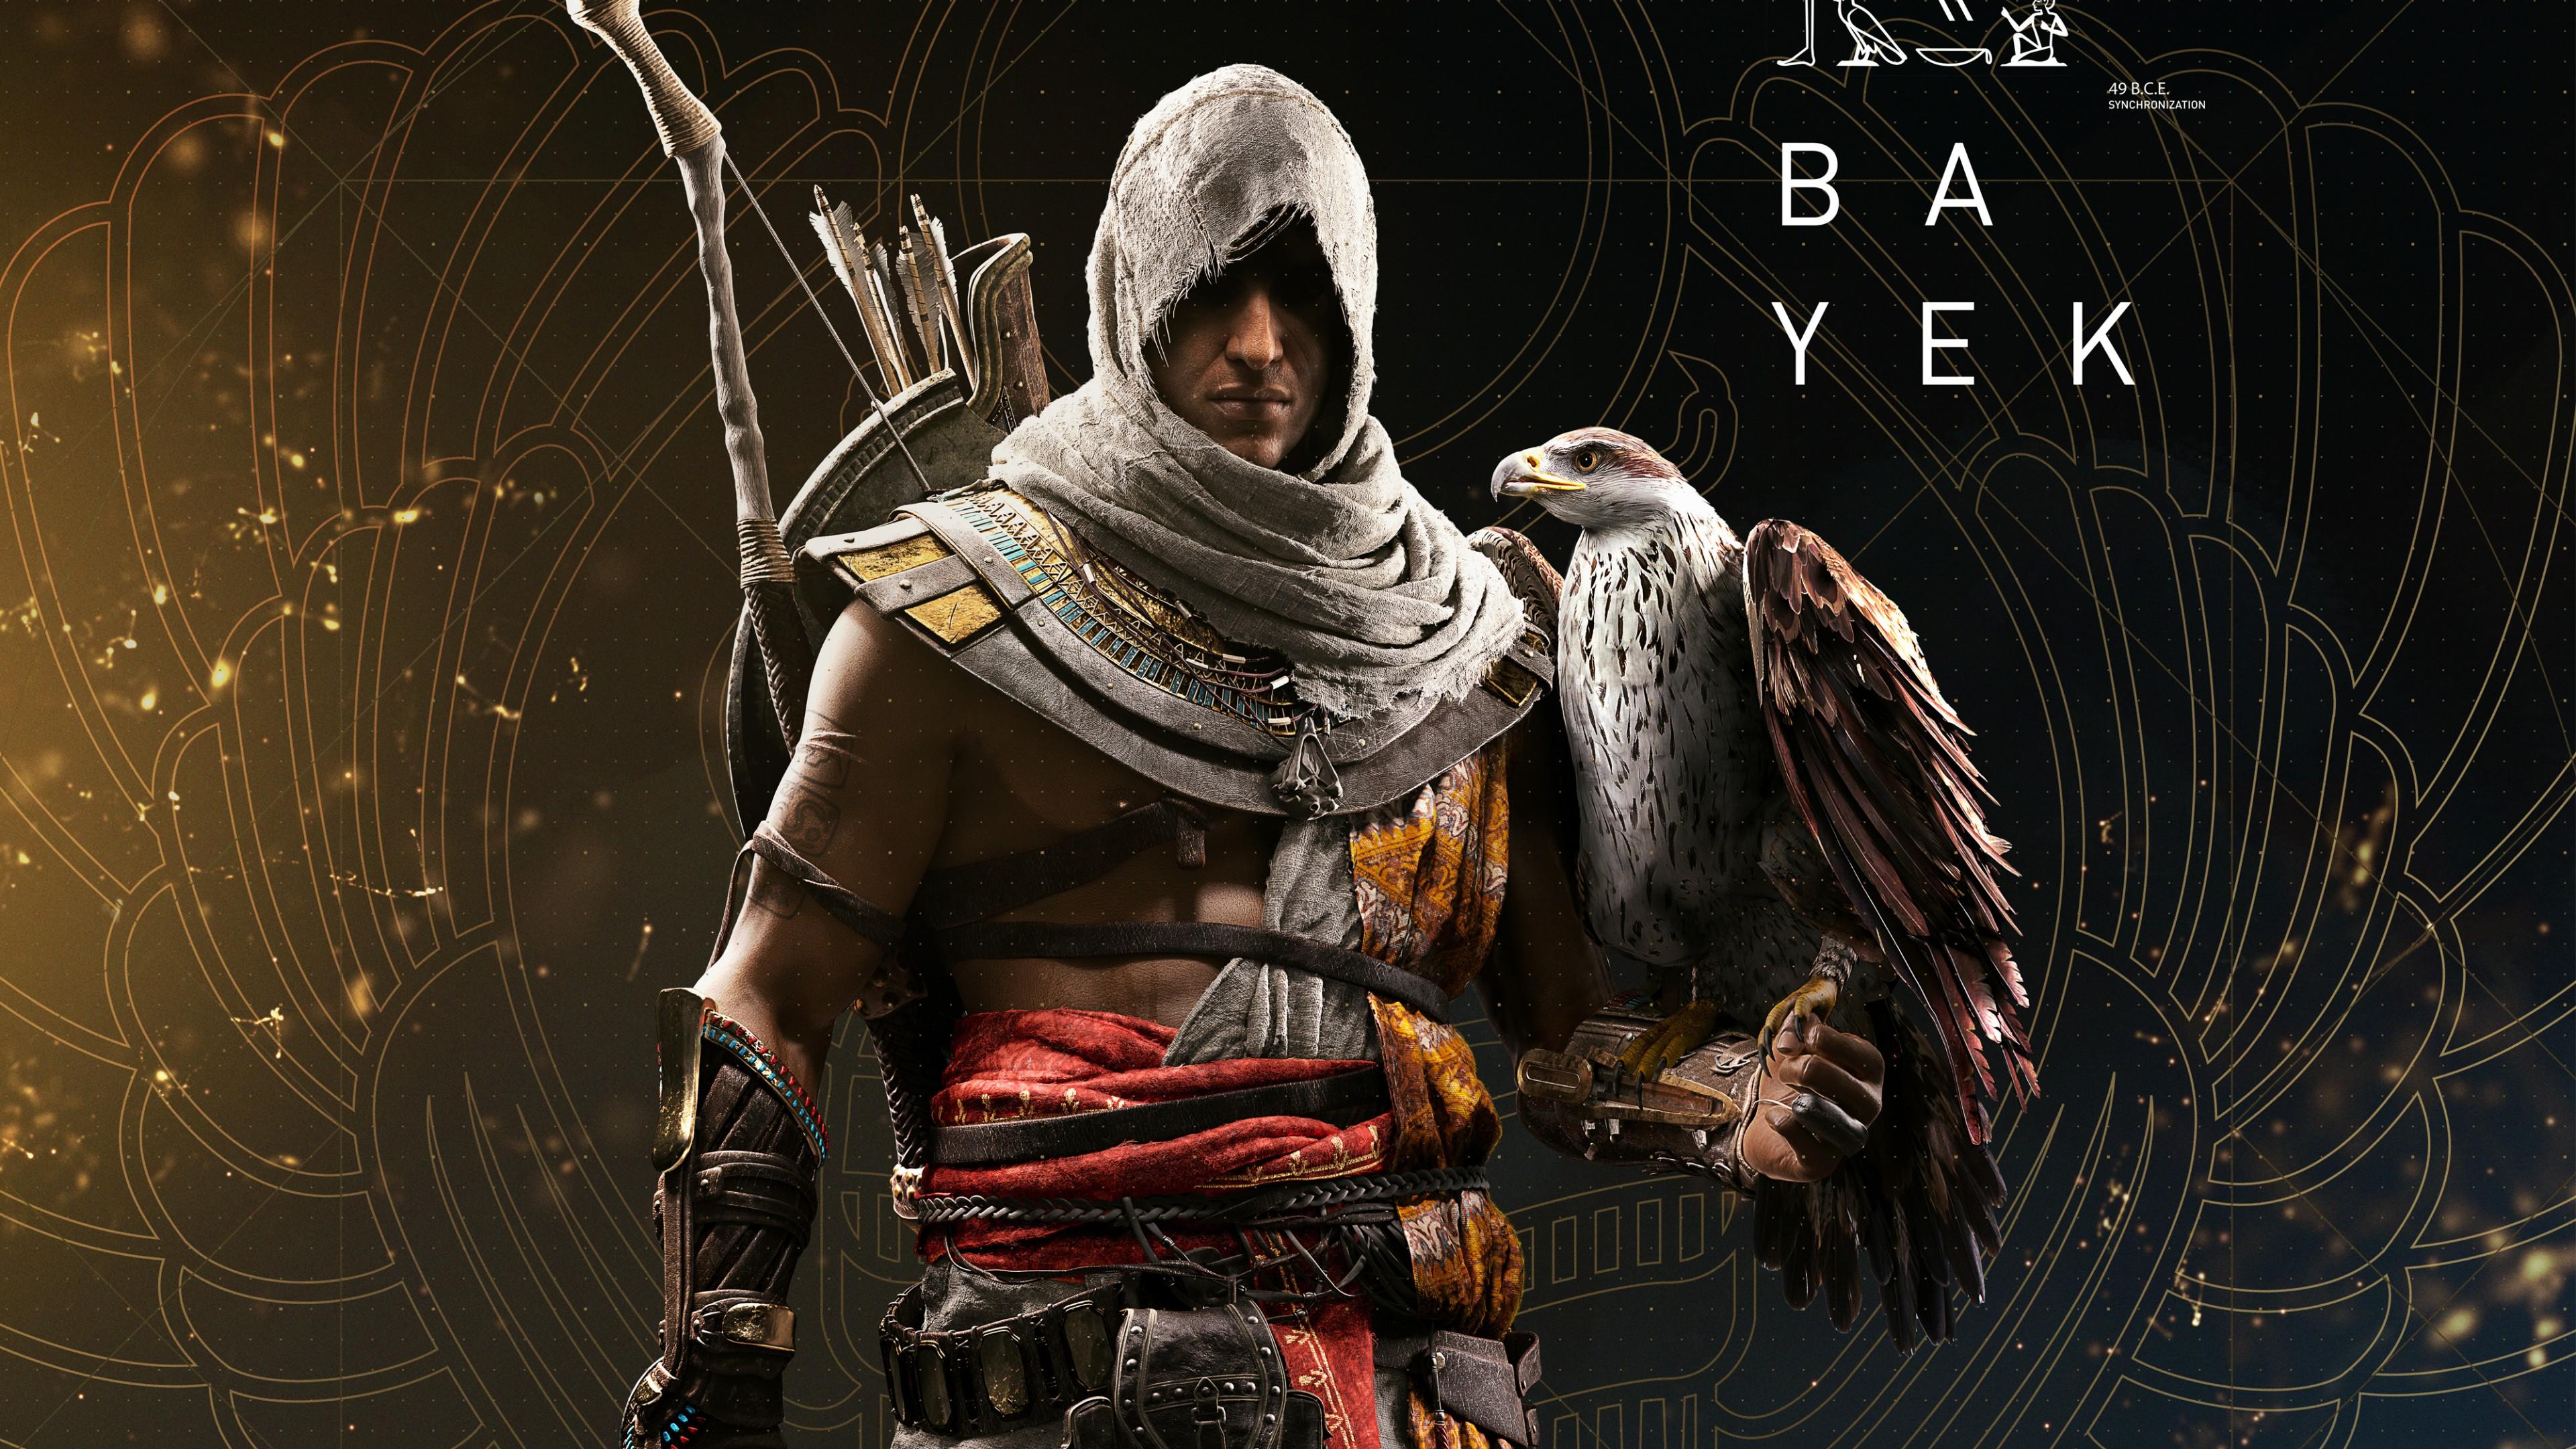 Free Download Assassins Creed Origins Hd Wallpaper For Desktop And